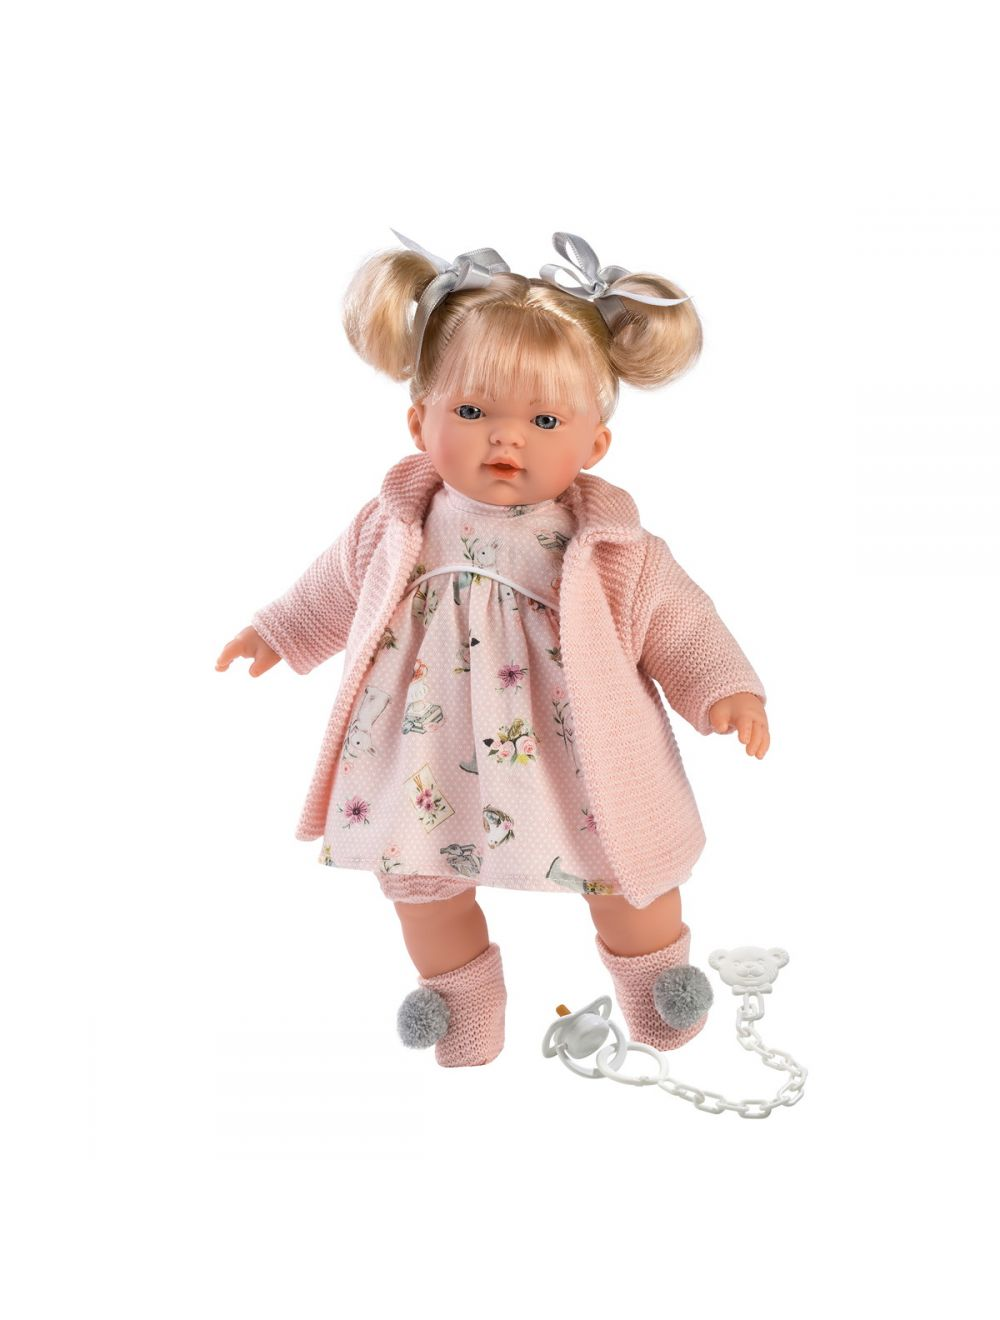 Llorens 33112 Lalka płacząca Aitana 33 cm cała różowa blondynka